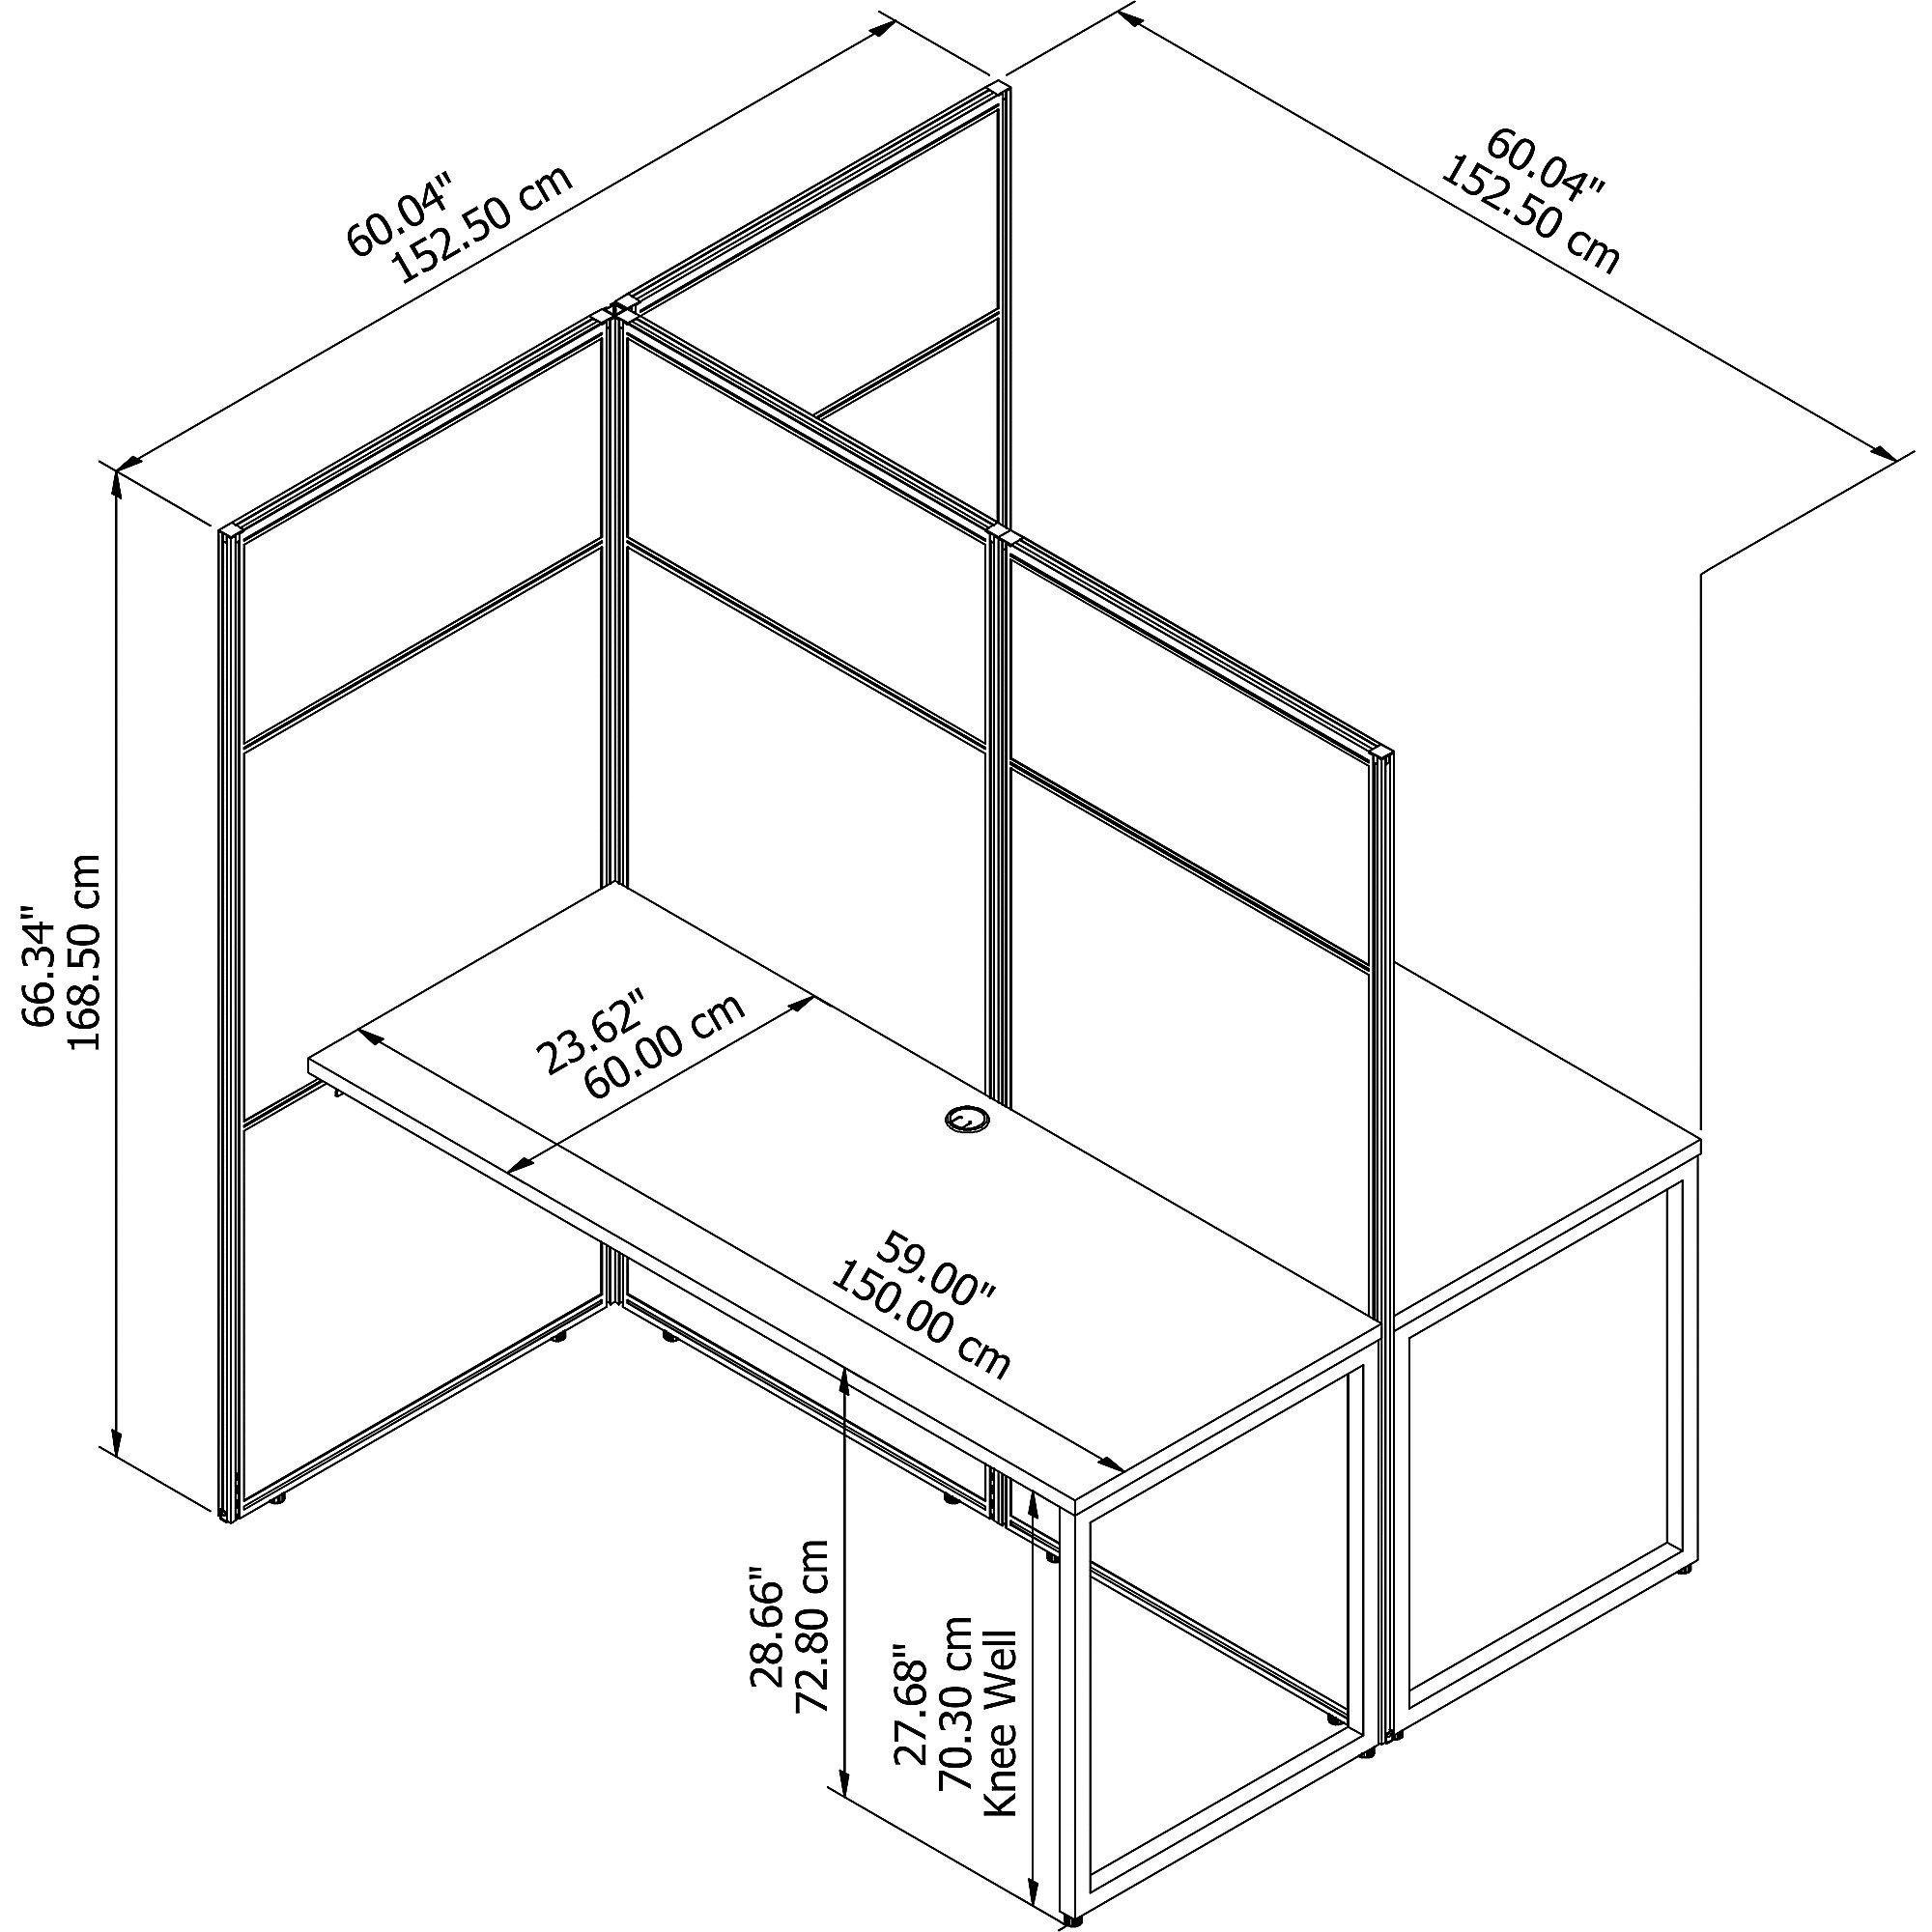 eodh460 cubicle dimensions